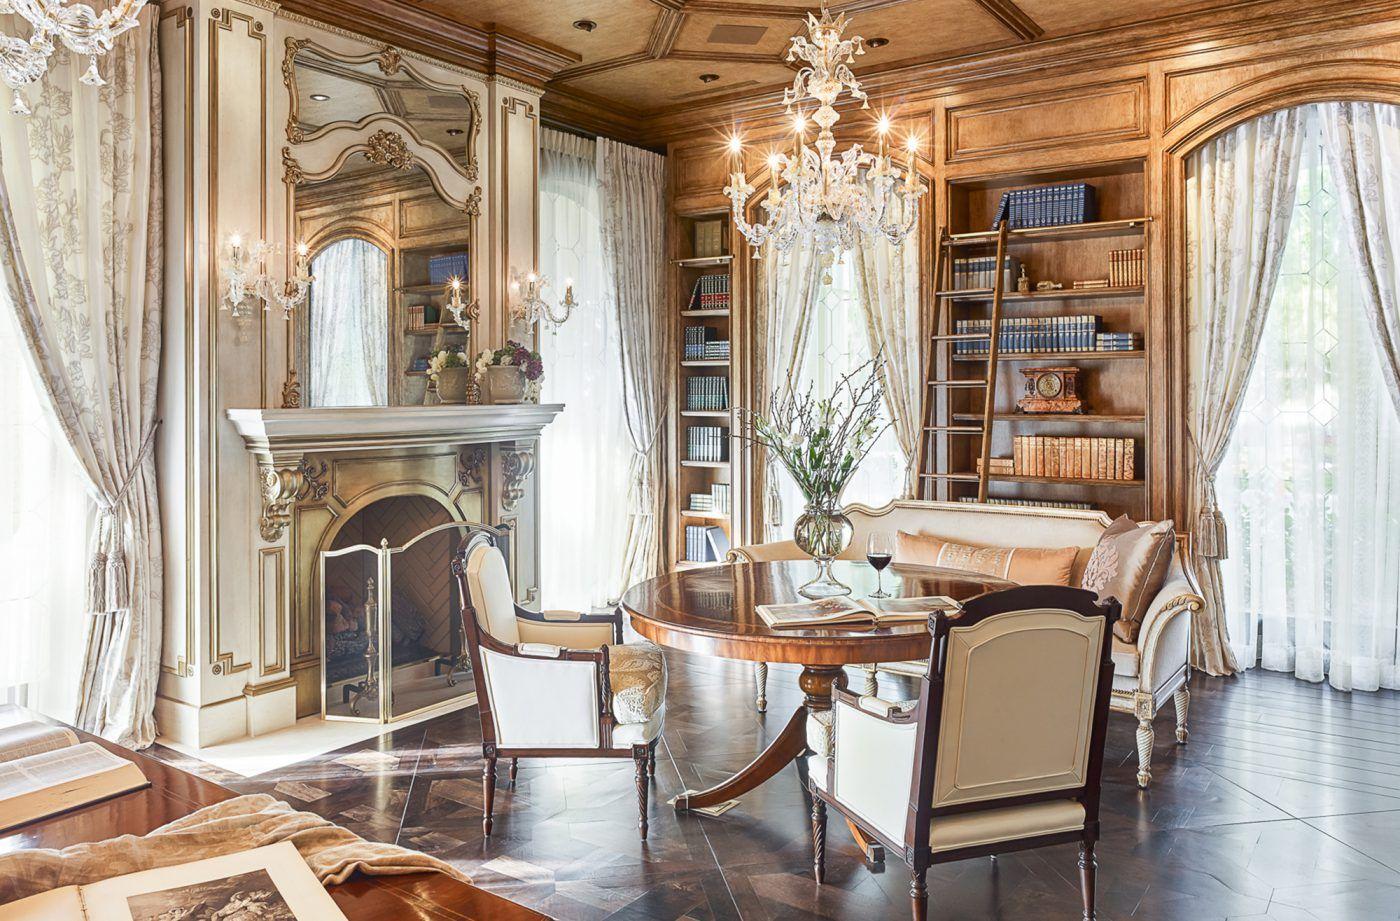 Renaissance Revival Library By Tara Dudley Interiors With Images Renaissance Revival Interior Home Decor